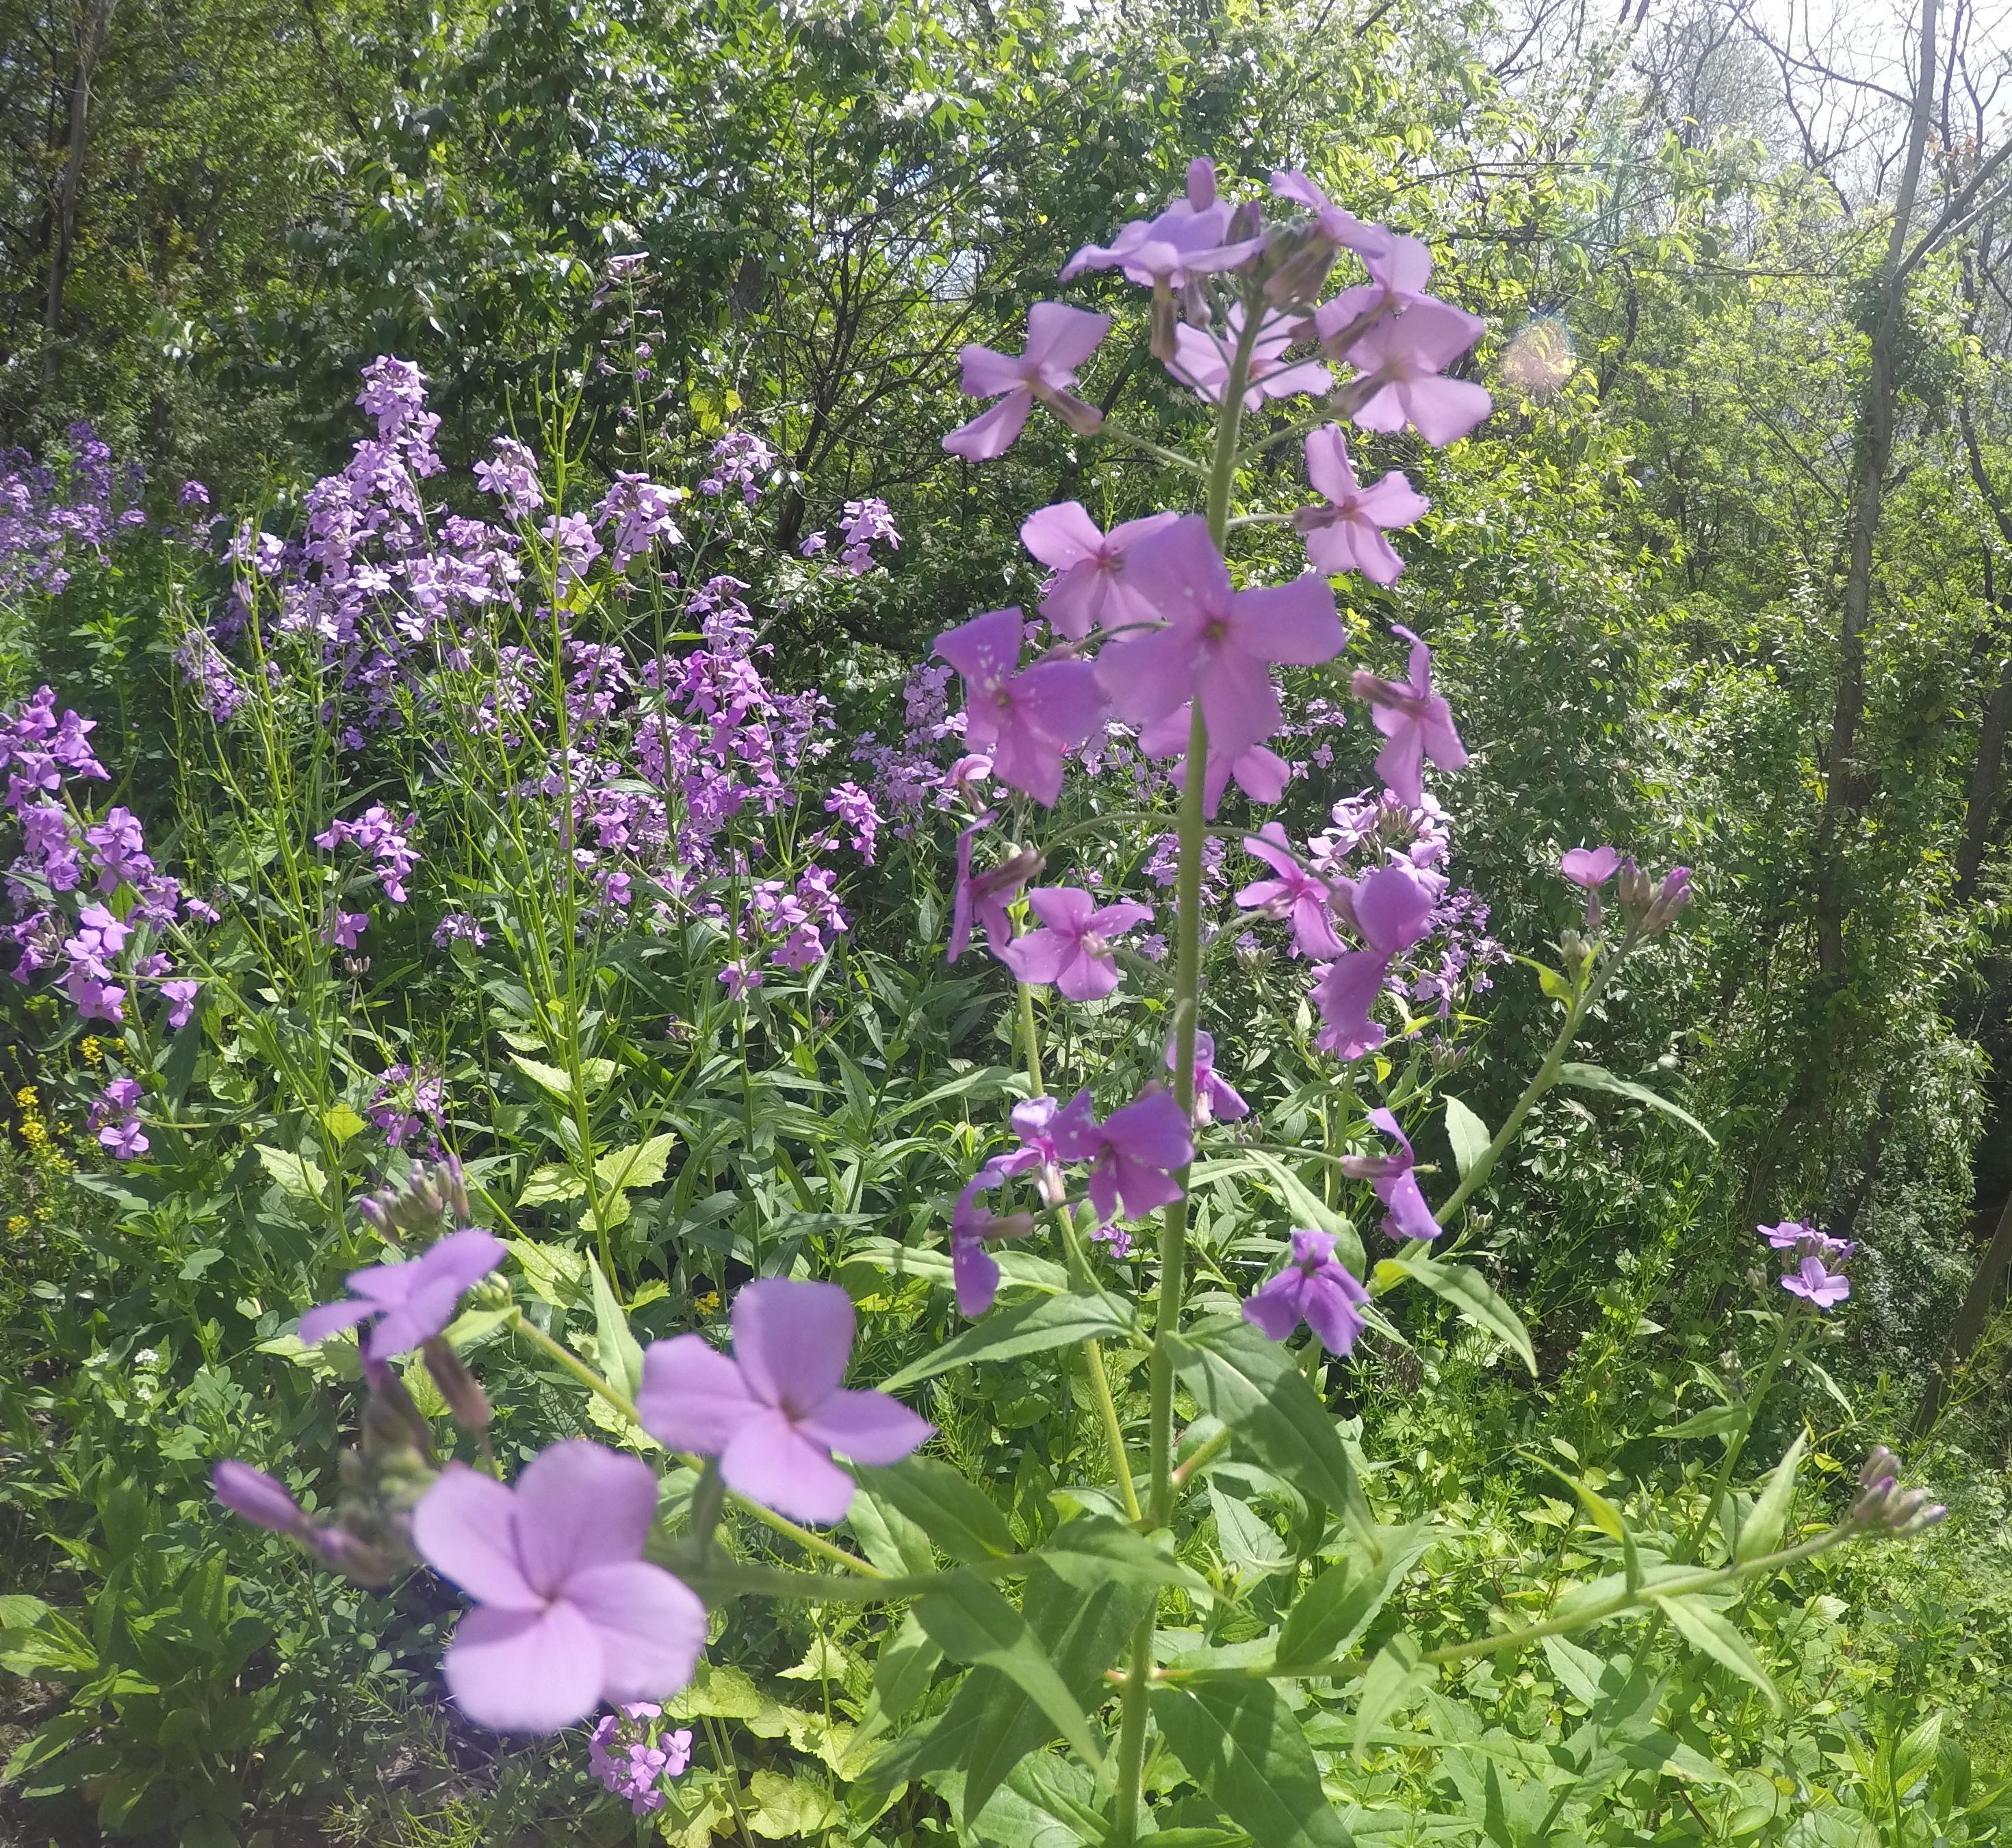 Purple Wildflowers along the Akron Rail Trail